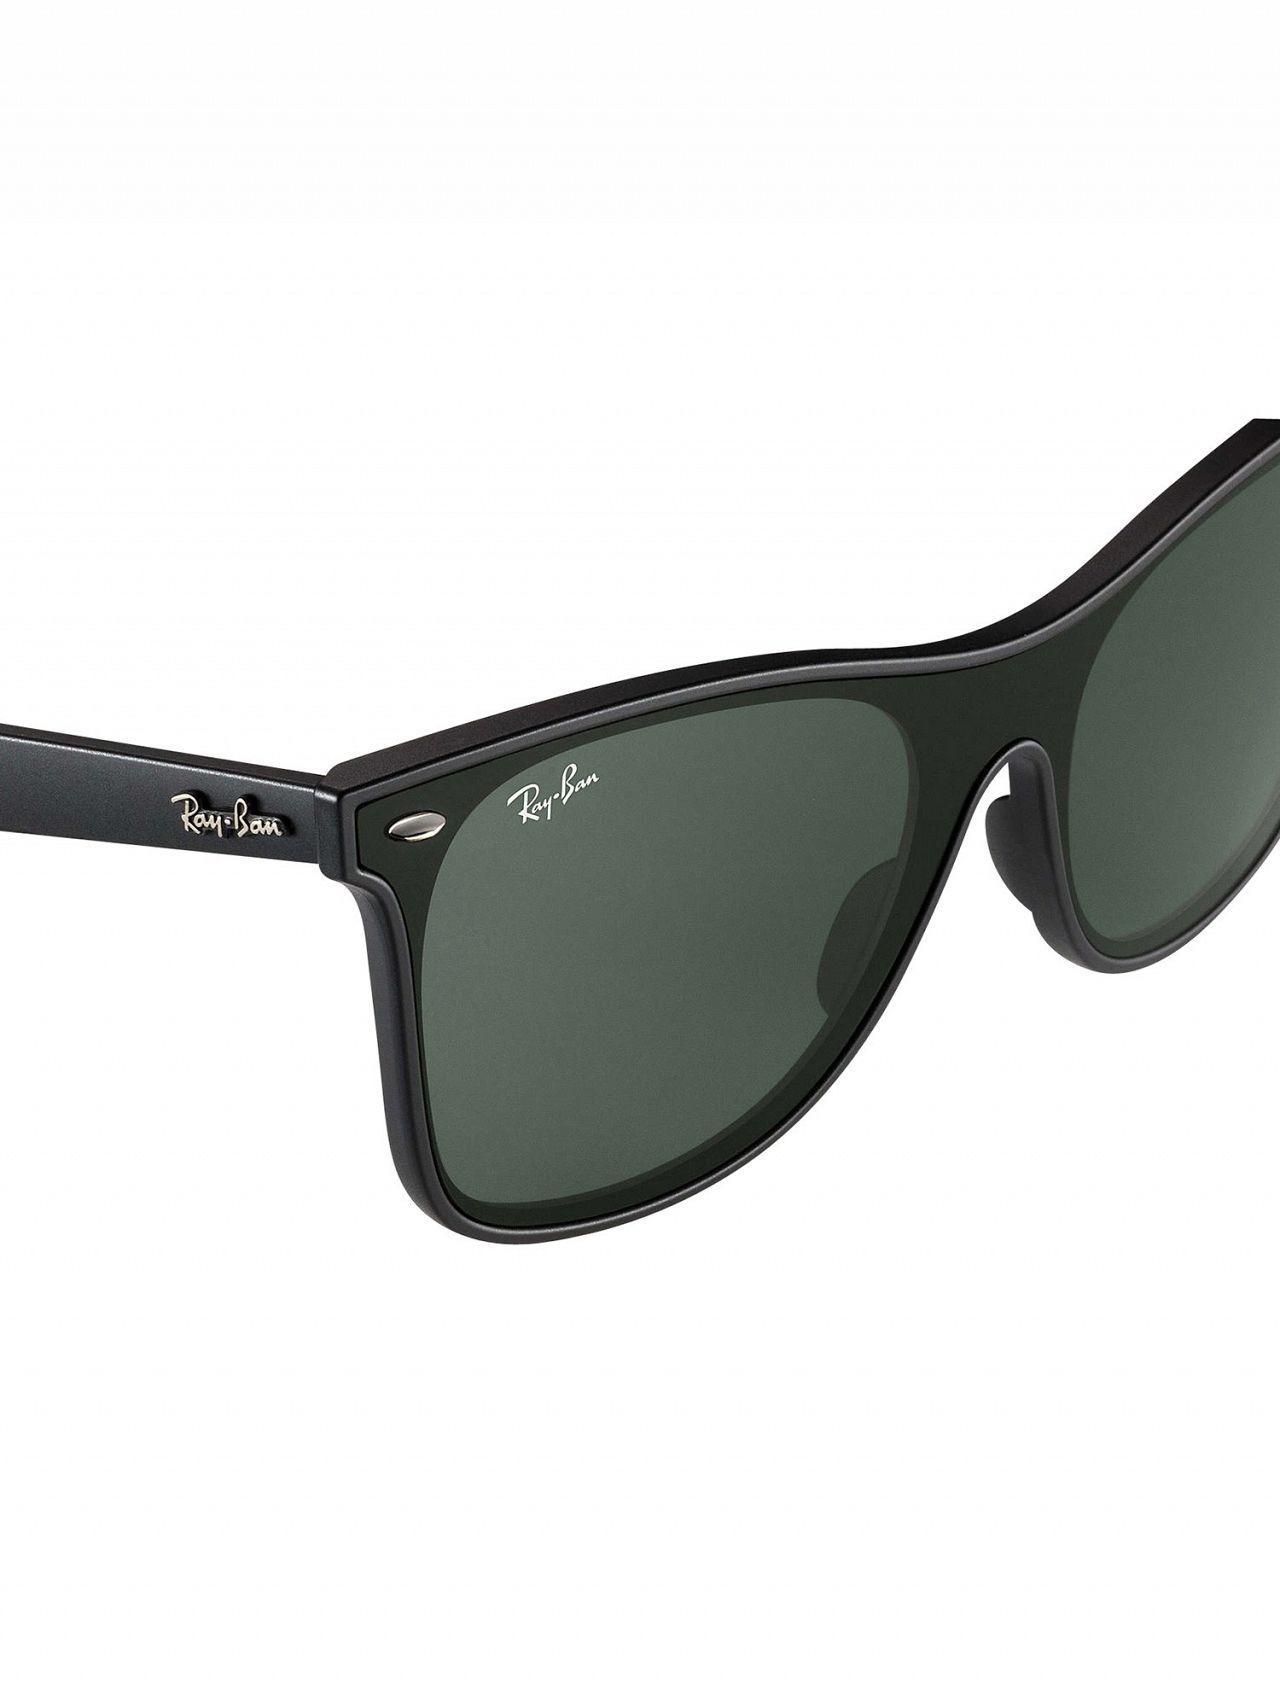 47aca2d630 Ray-Ban - Black Rb4440n Blaze Wayfarer Sunglasses for Men - Lyst. View  fullscreen